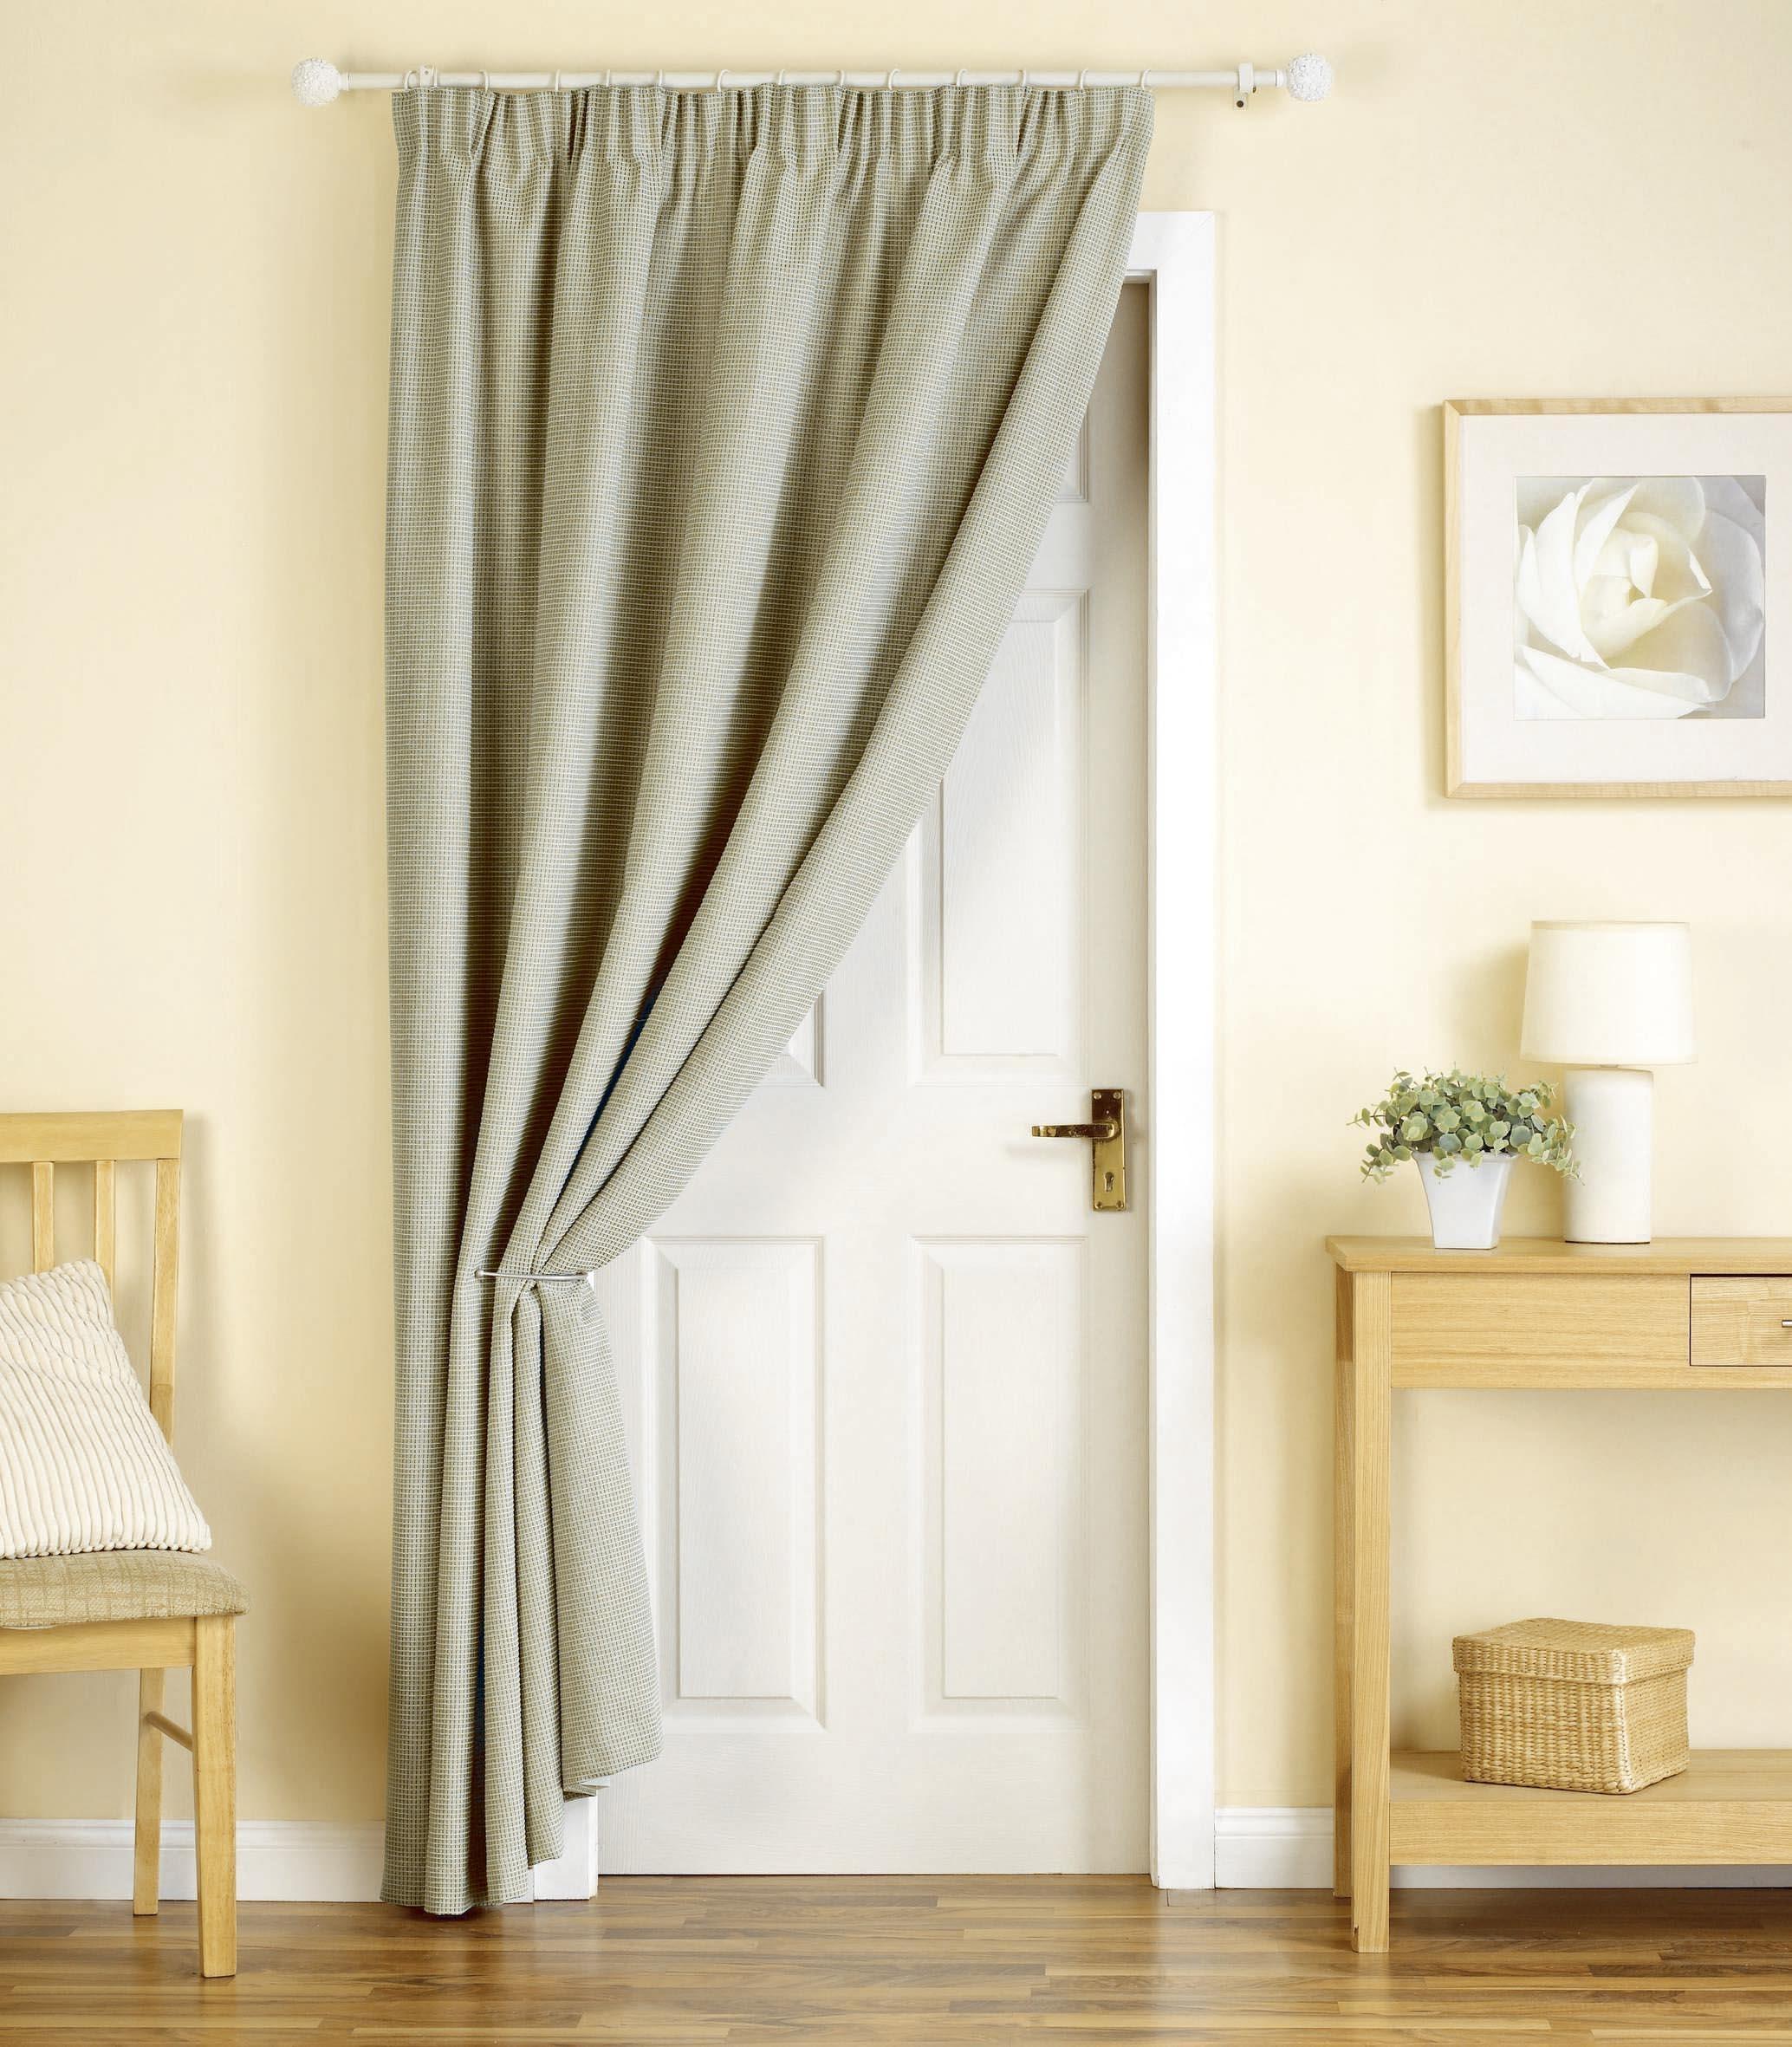 Door Curtain Ideas Best 20 Front Door Curtains Ideas On Throughout Doorway Curtains (View 11 of 25)